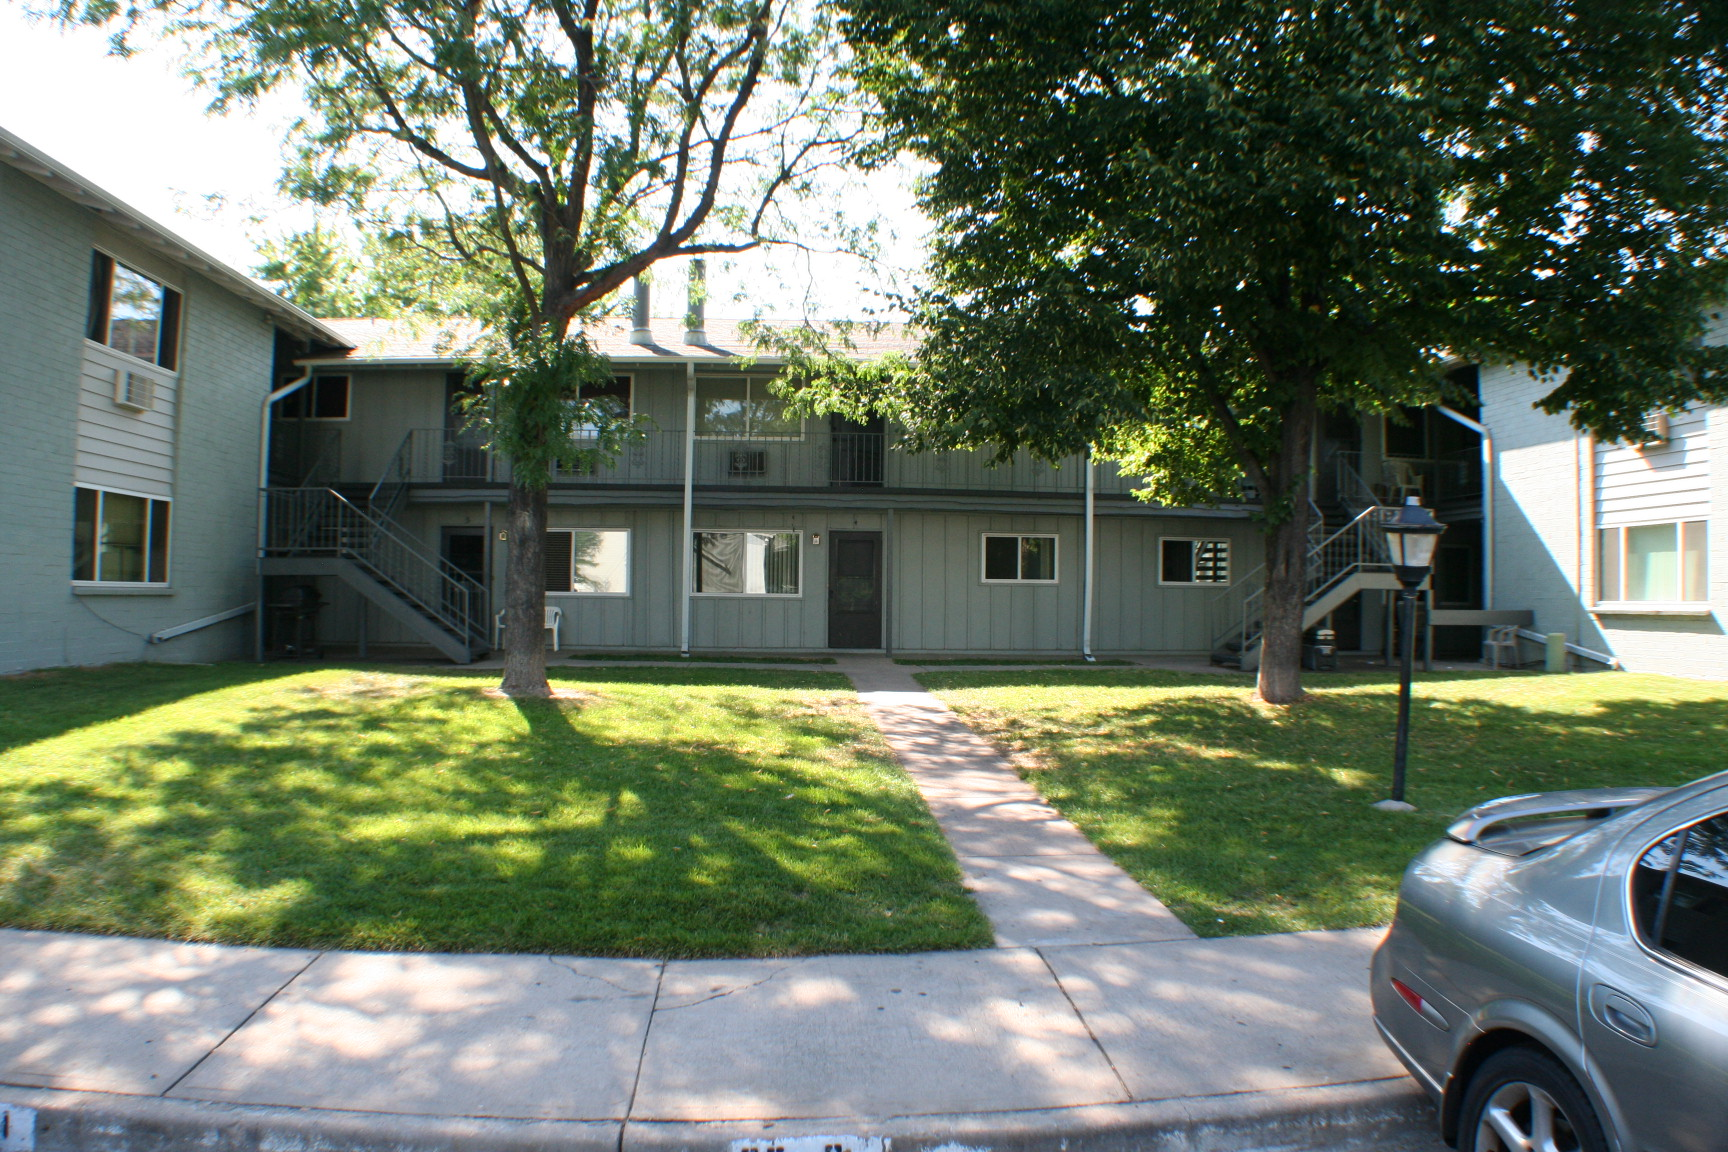 westridge apartments lakewood colorado - 28 images - westridge ...